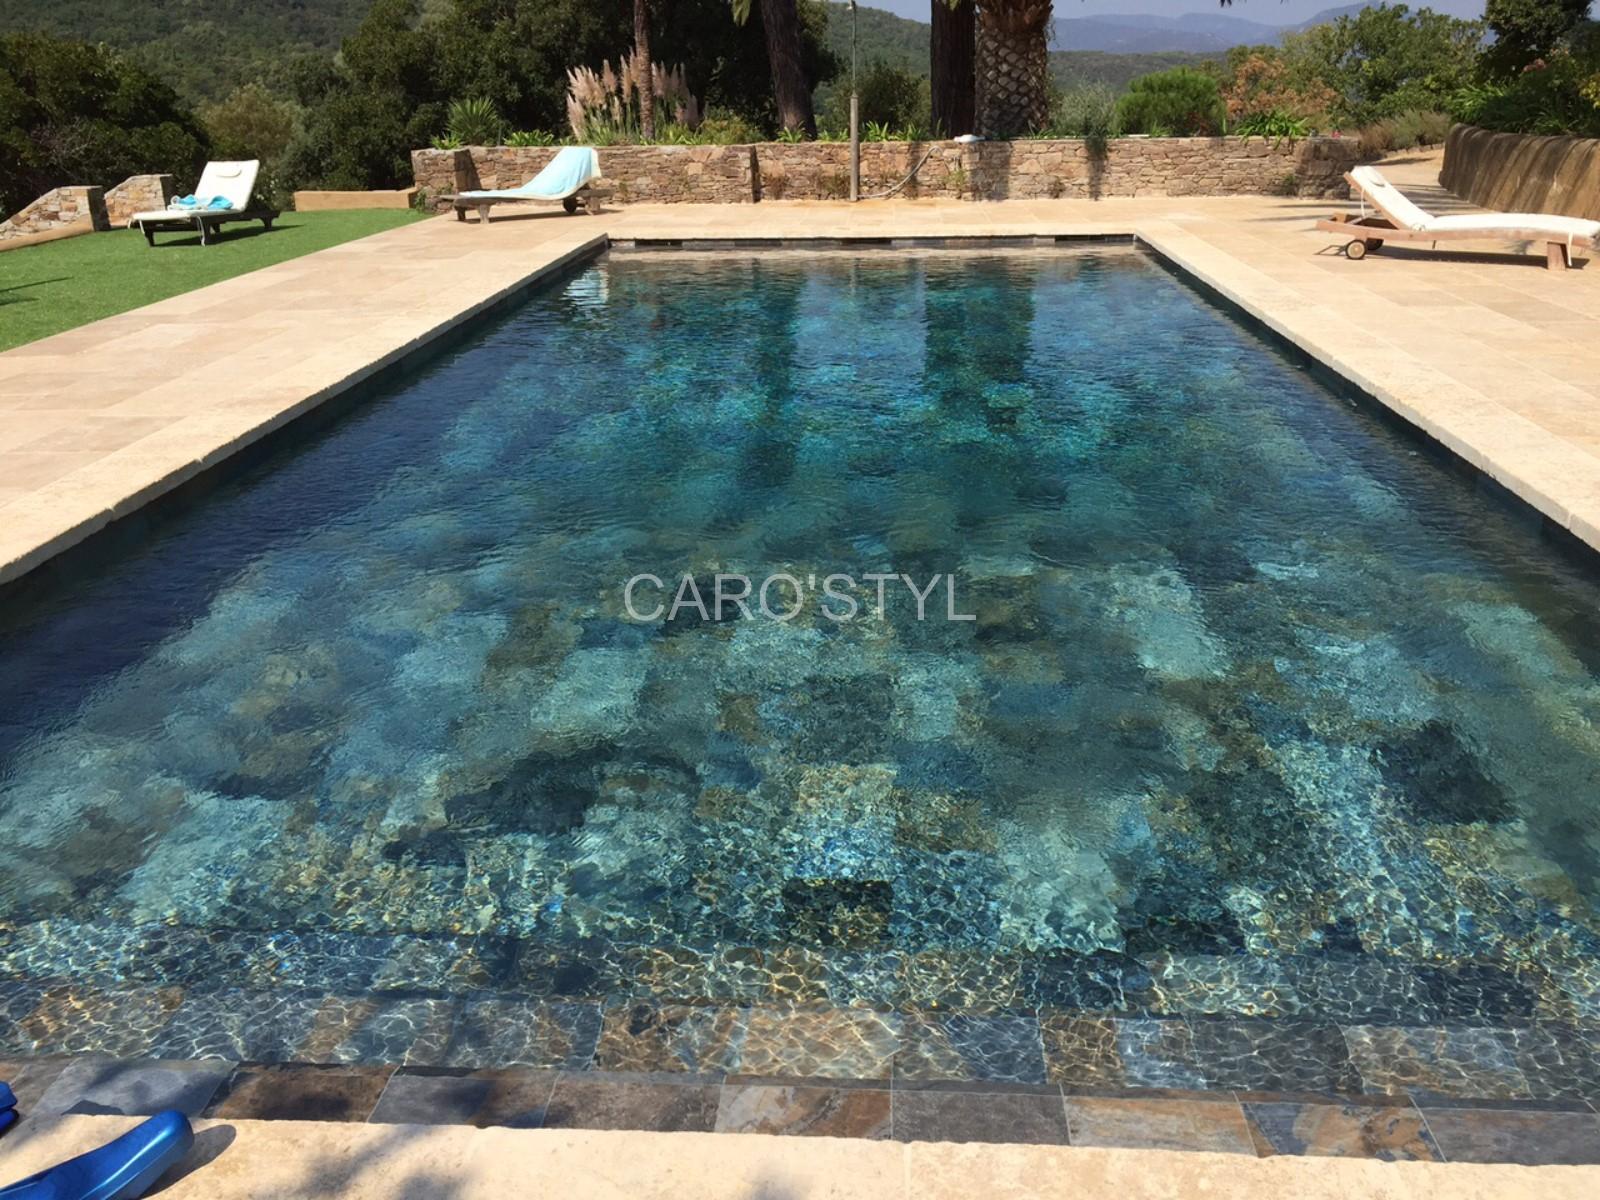 Piscine En Carrelage Green Bali® 30X60 Cm Grand Format, Aux ... dedans Carrelage Piscine Bali 30X60